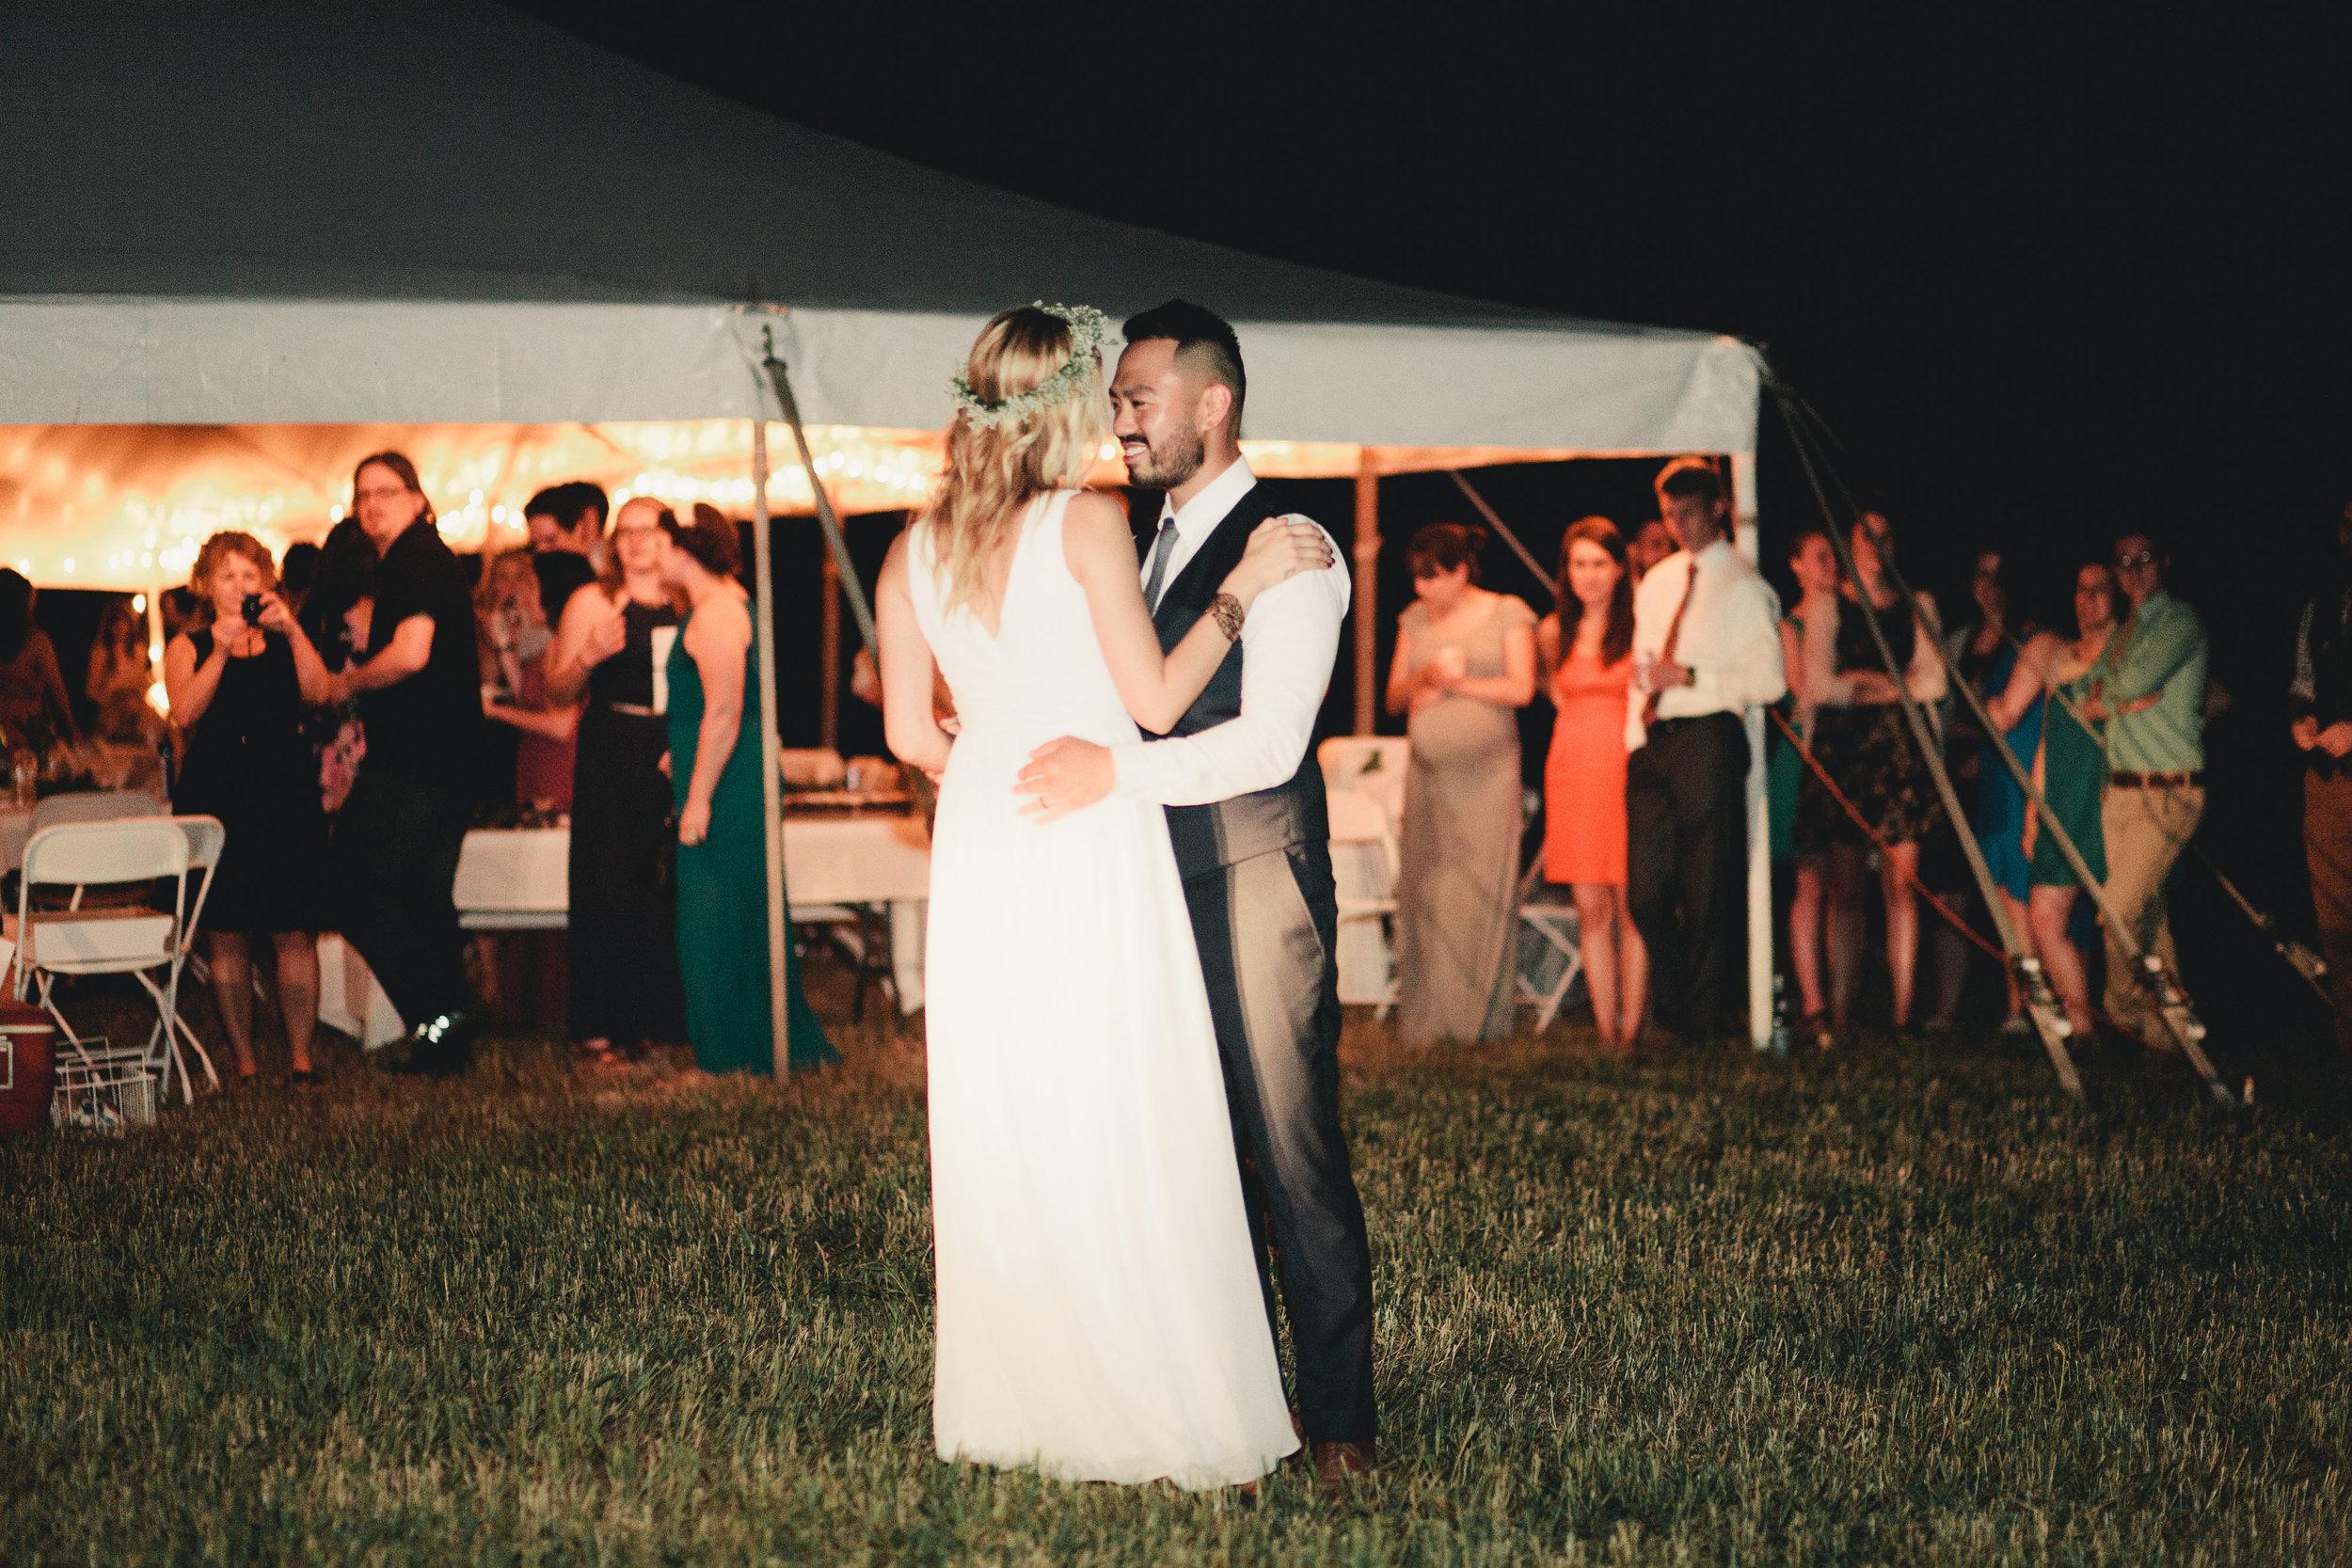 Emily and Zach-Wedding Finals 2-0254.jpg